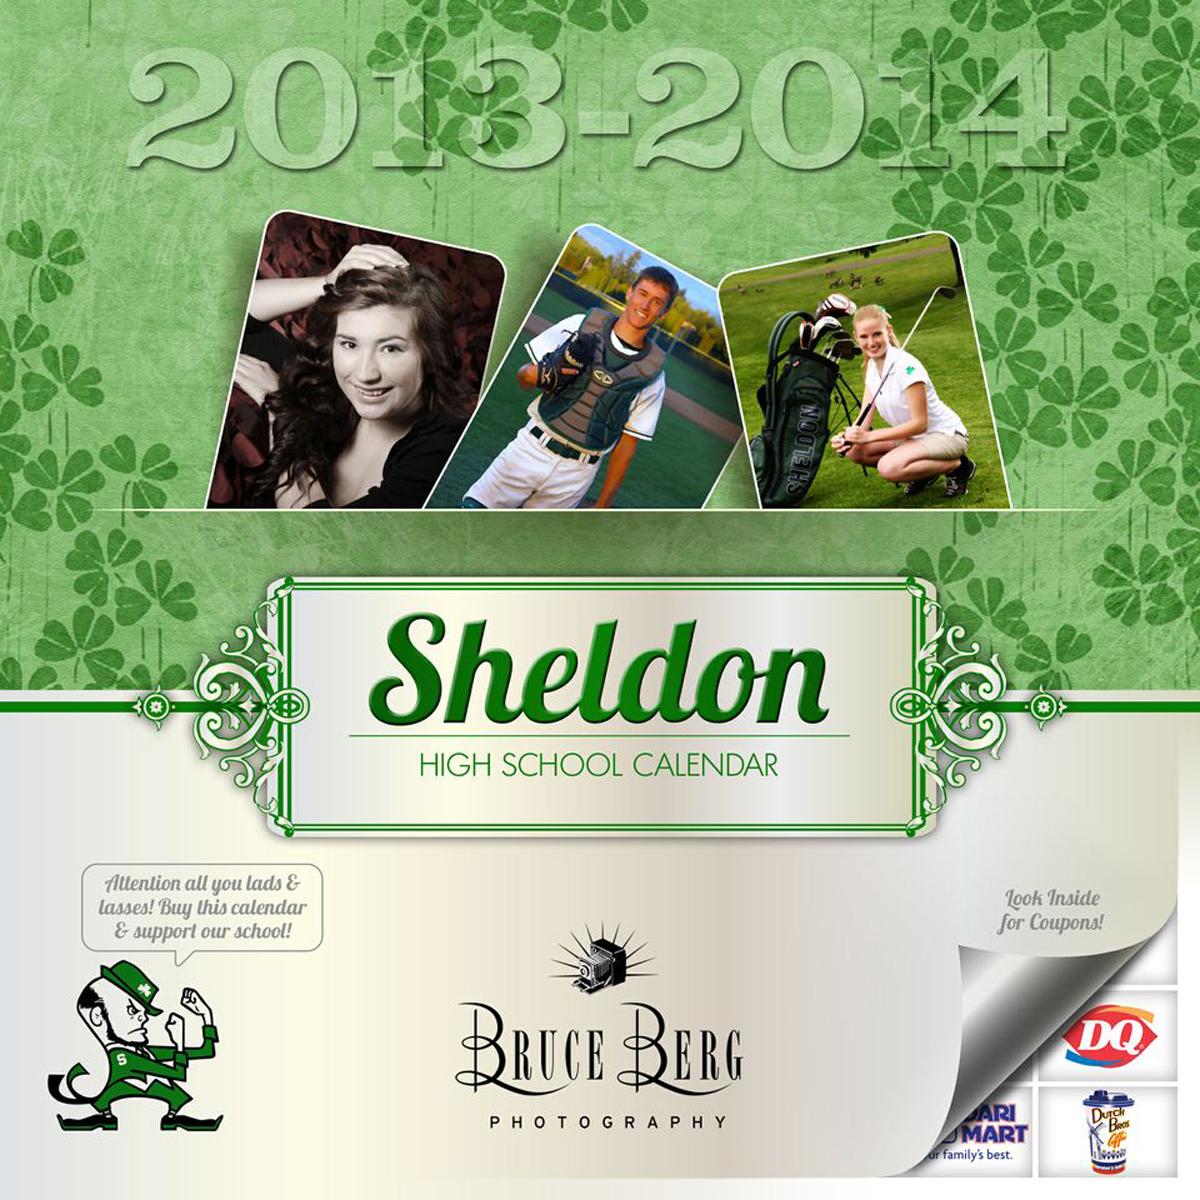 Sheldon High School fundraiser